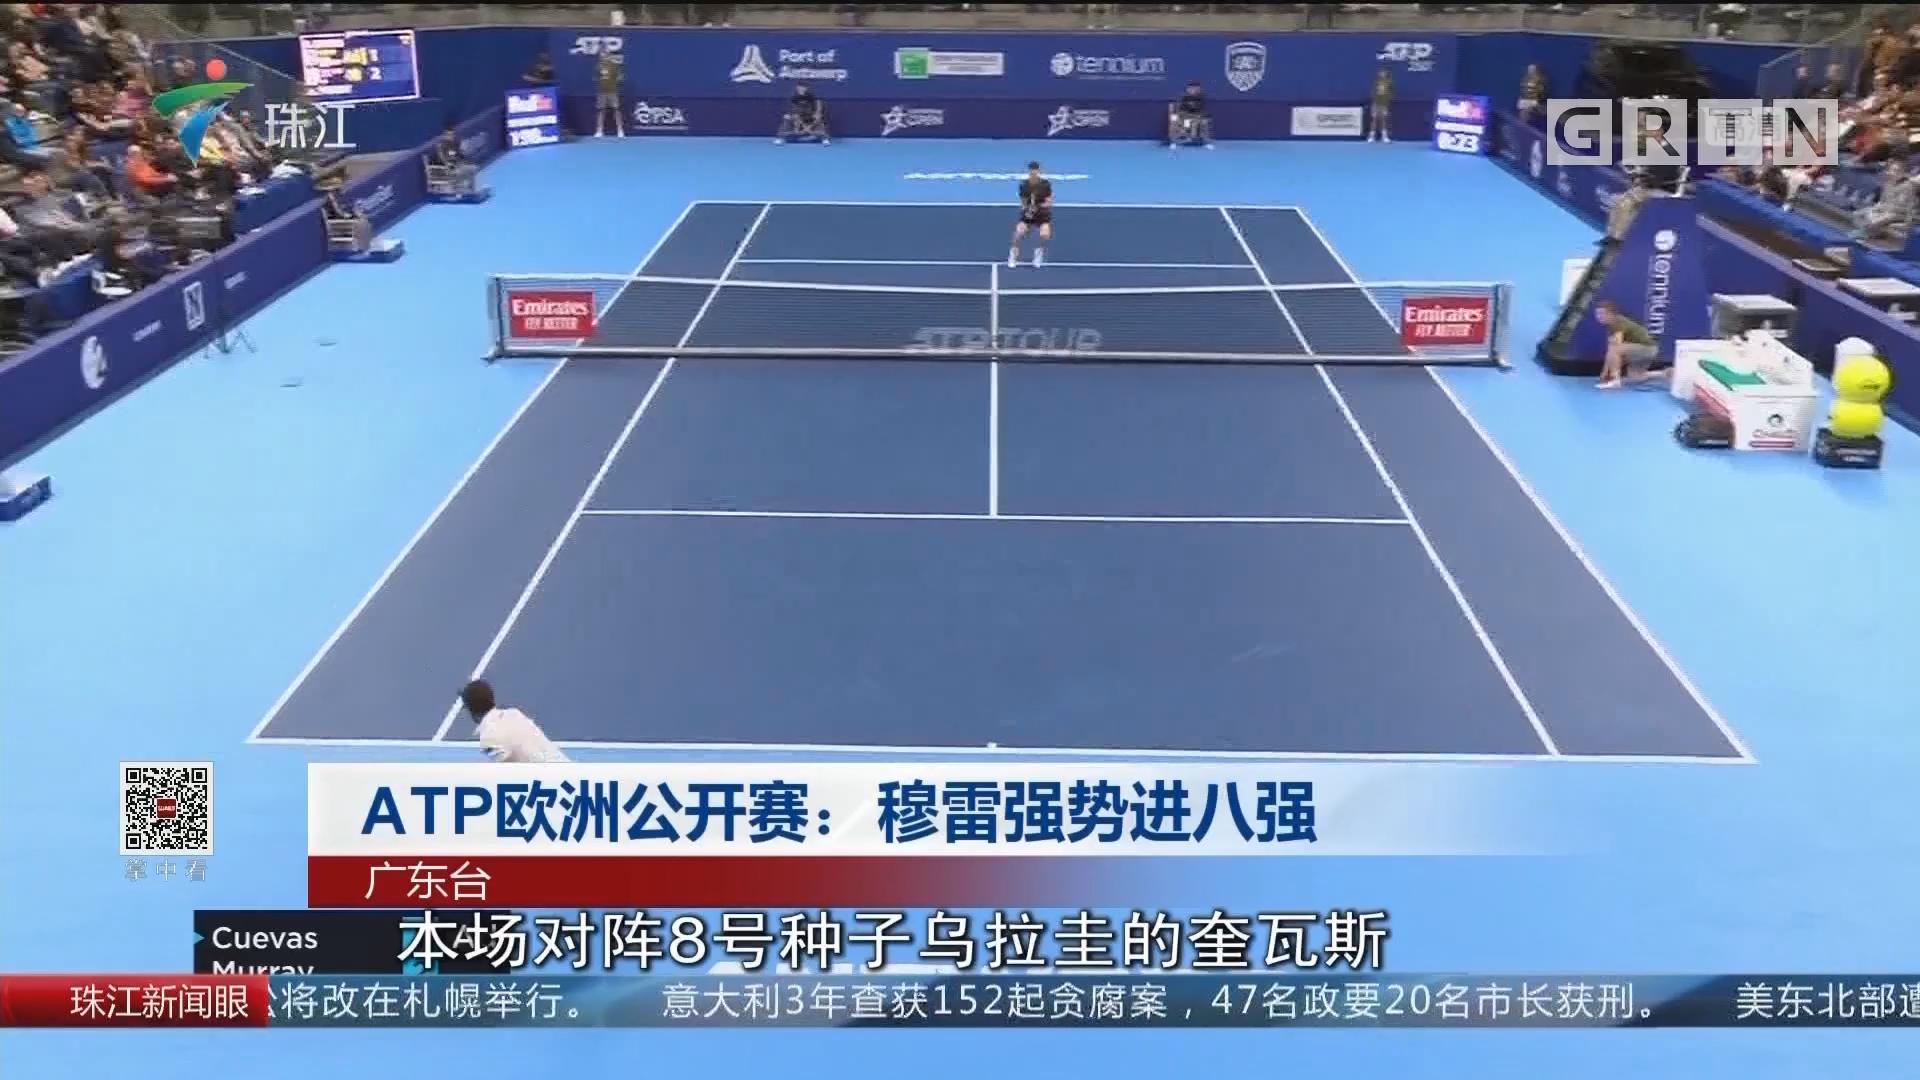 ATP欧洲公开賽:穆雷强势进八强